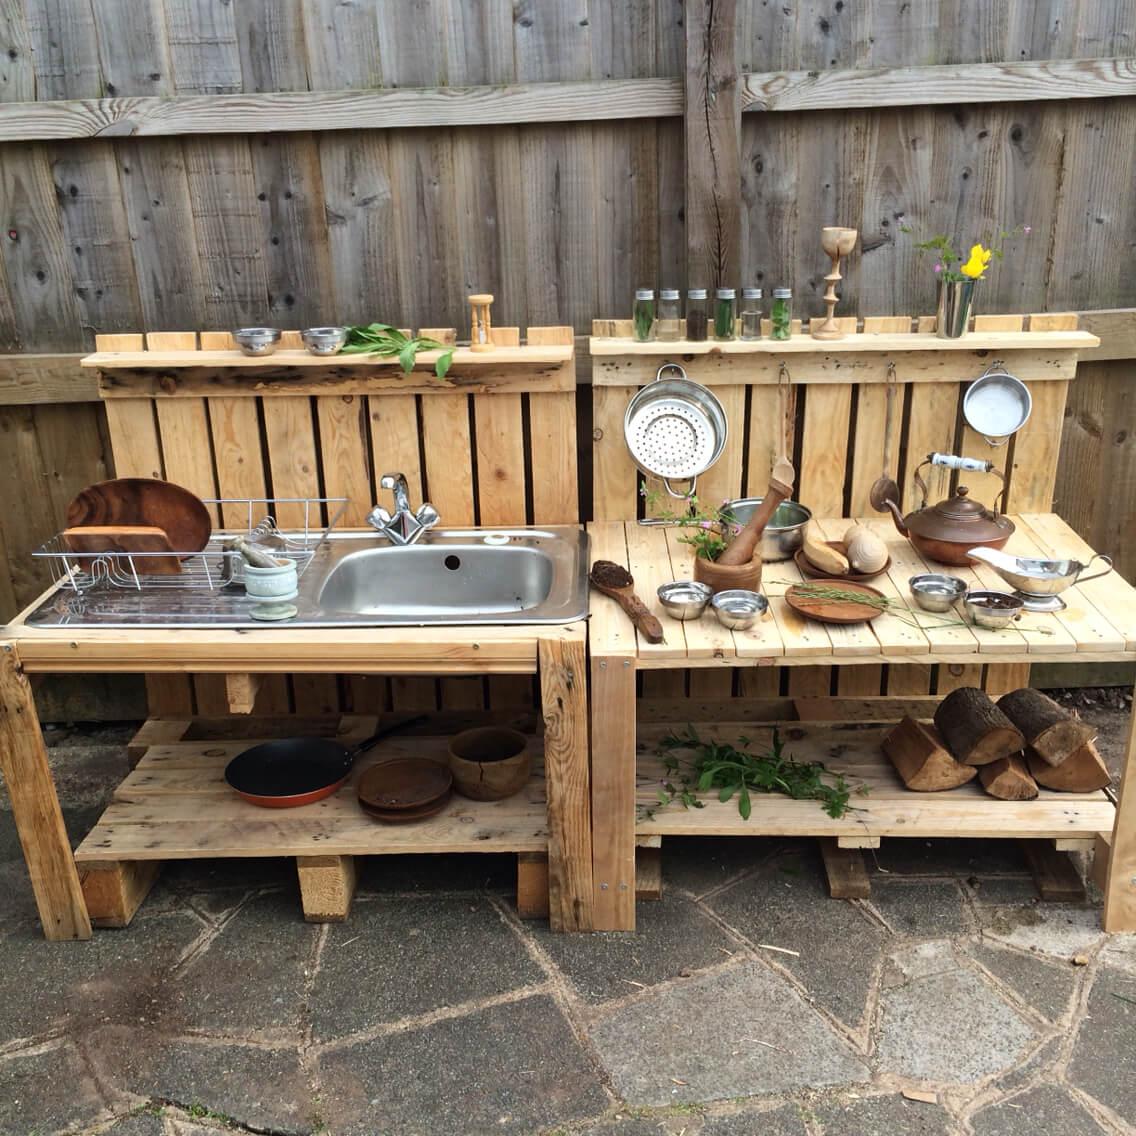 DIY Wood Pallet Sink and Prep Station